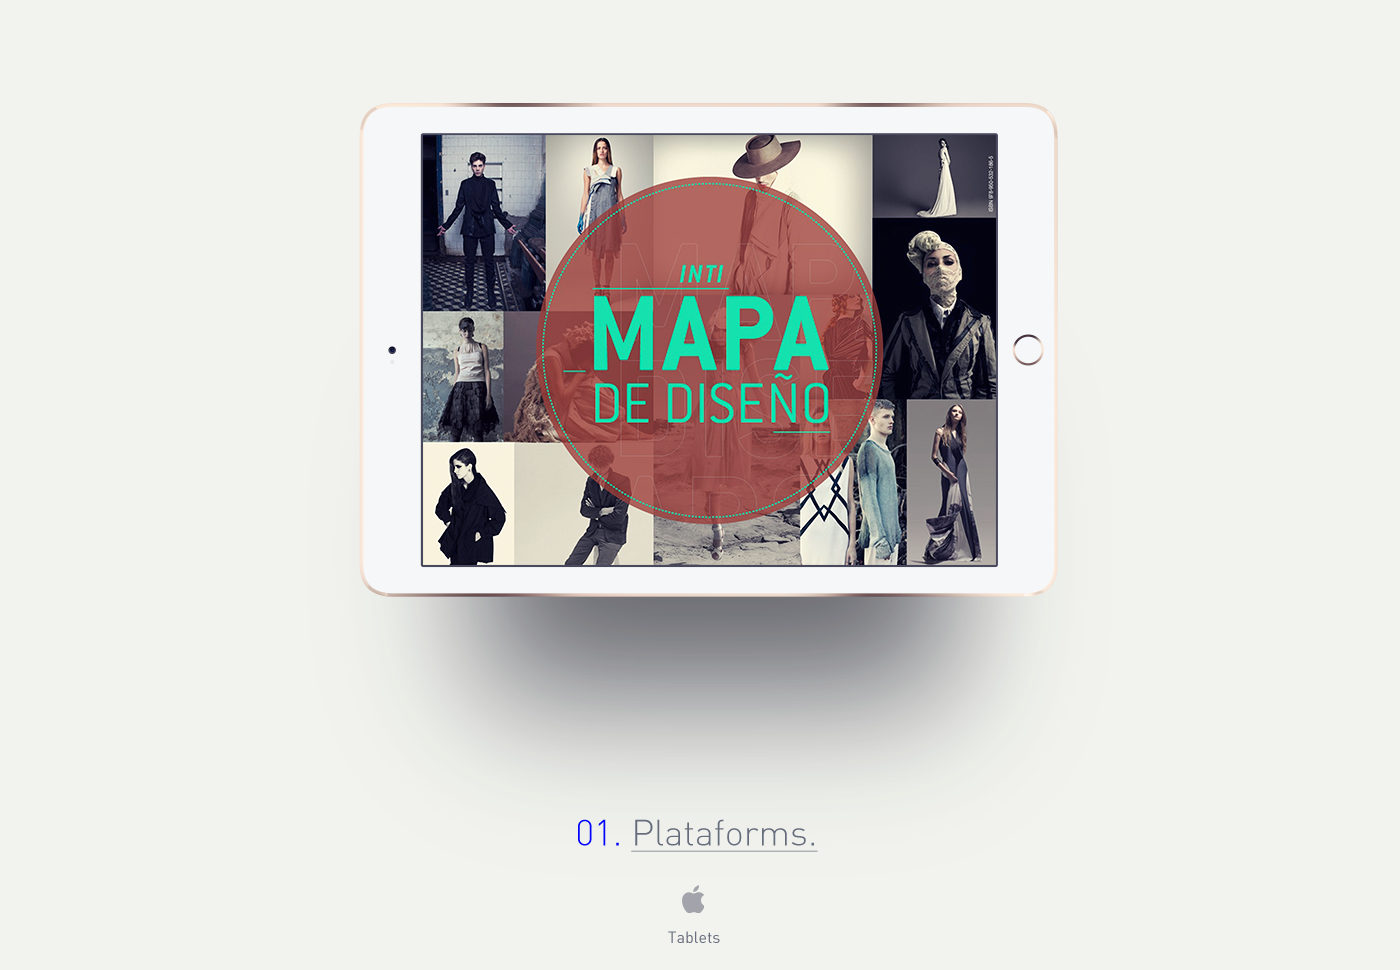 INTI - Mapa de Diseño